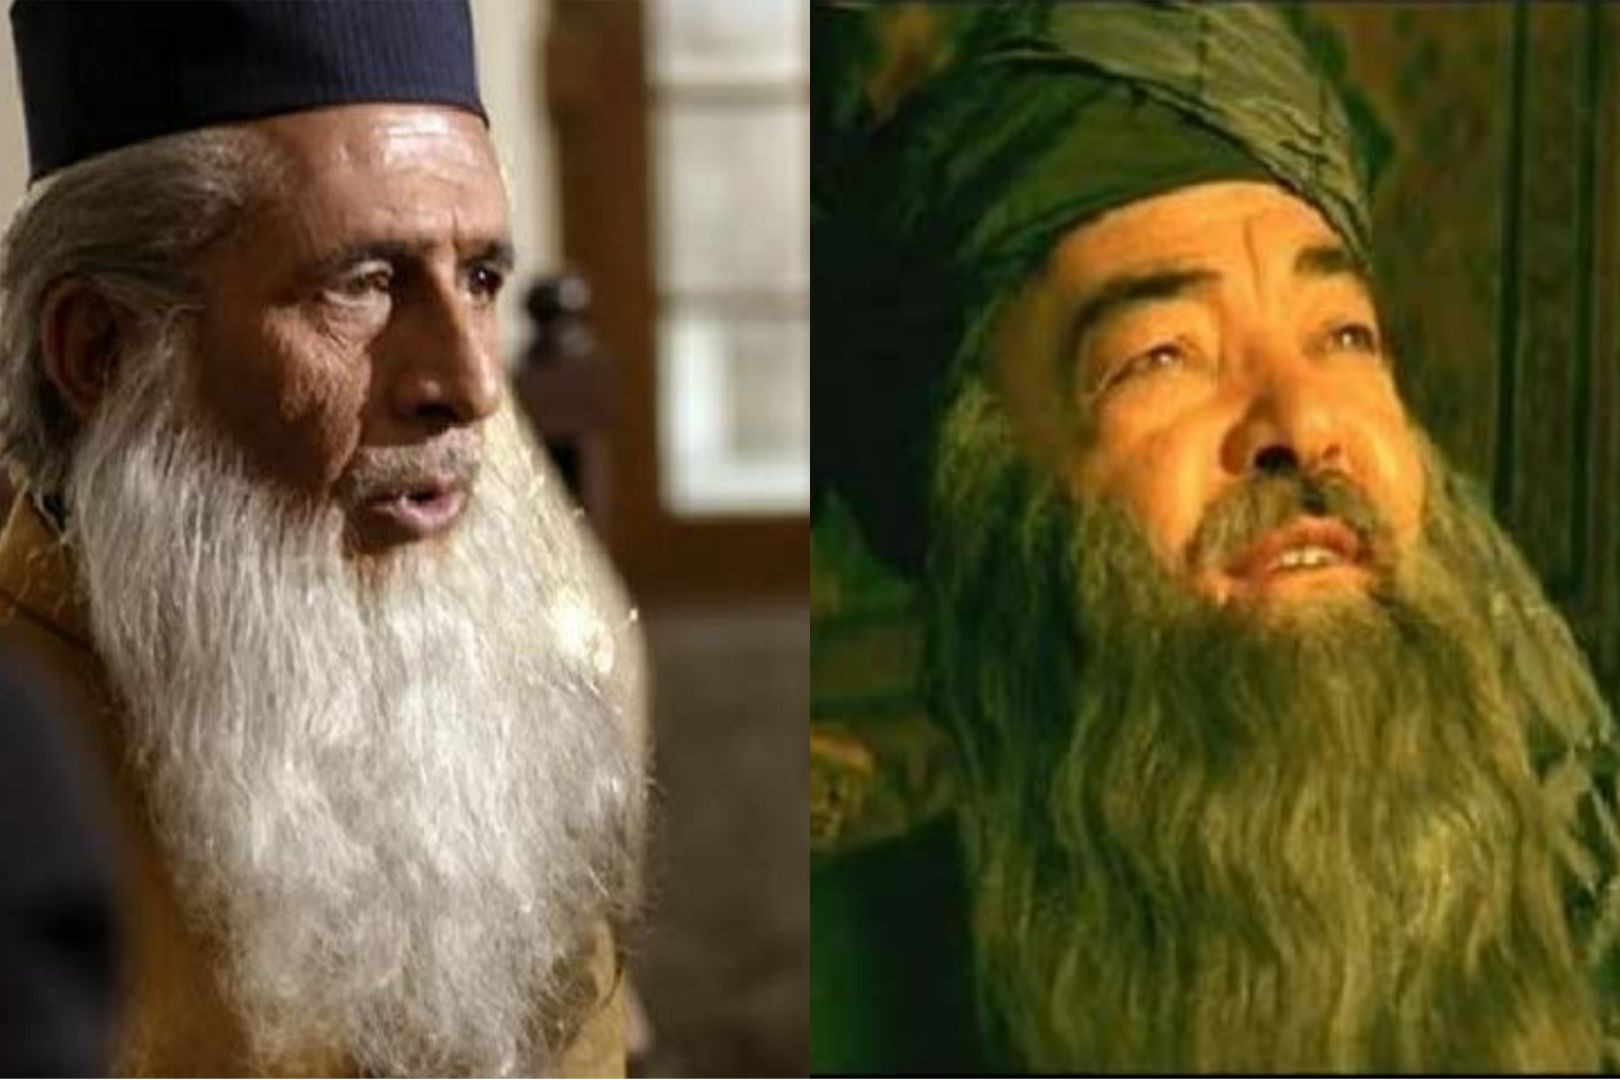 Maulana Wali (Naseeruddin Shah) and Maulana Tahiri (Rasheed Niaz) face off in court in the climactic scene of the film